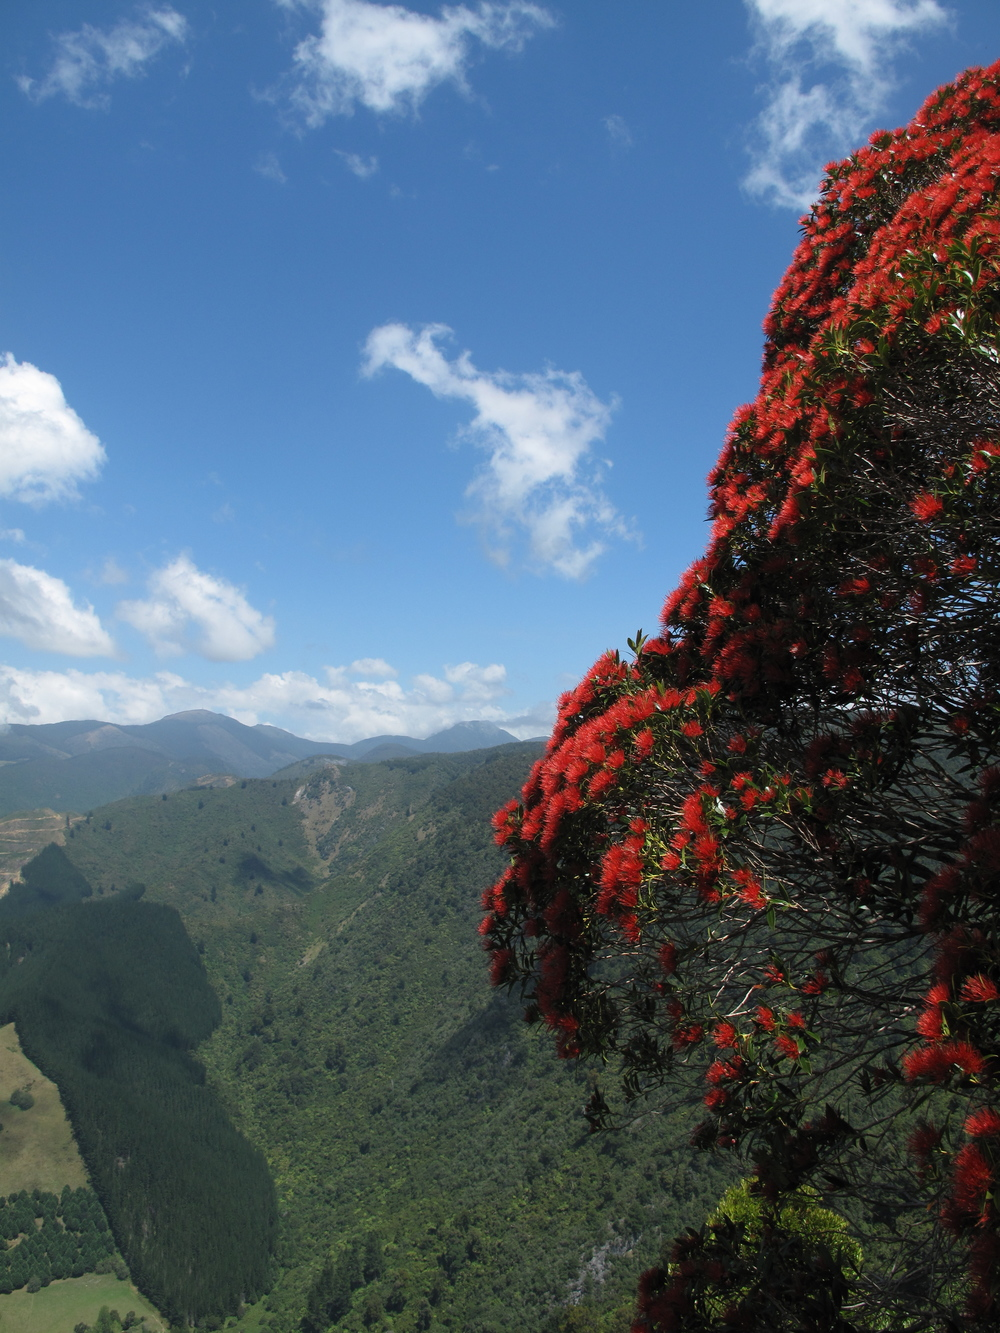 Pohutukawa tree NZ in hills of green